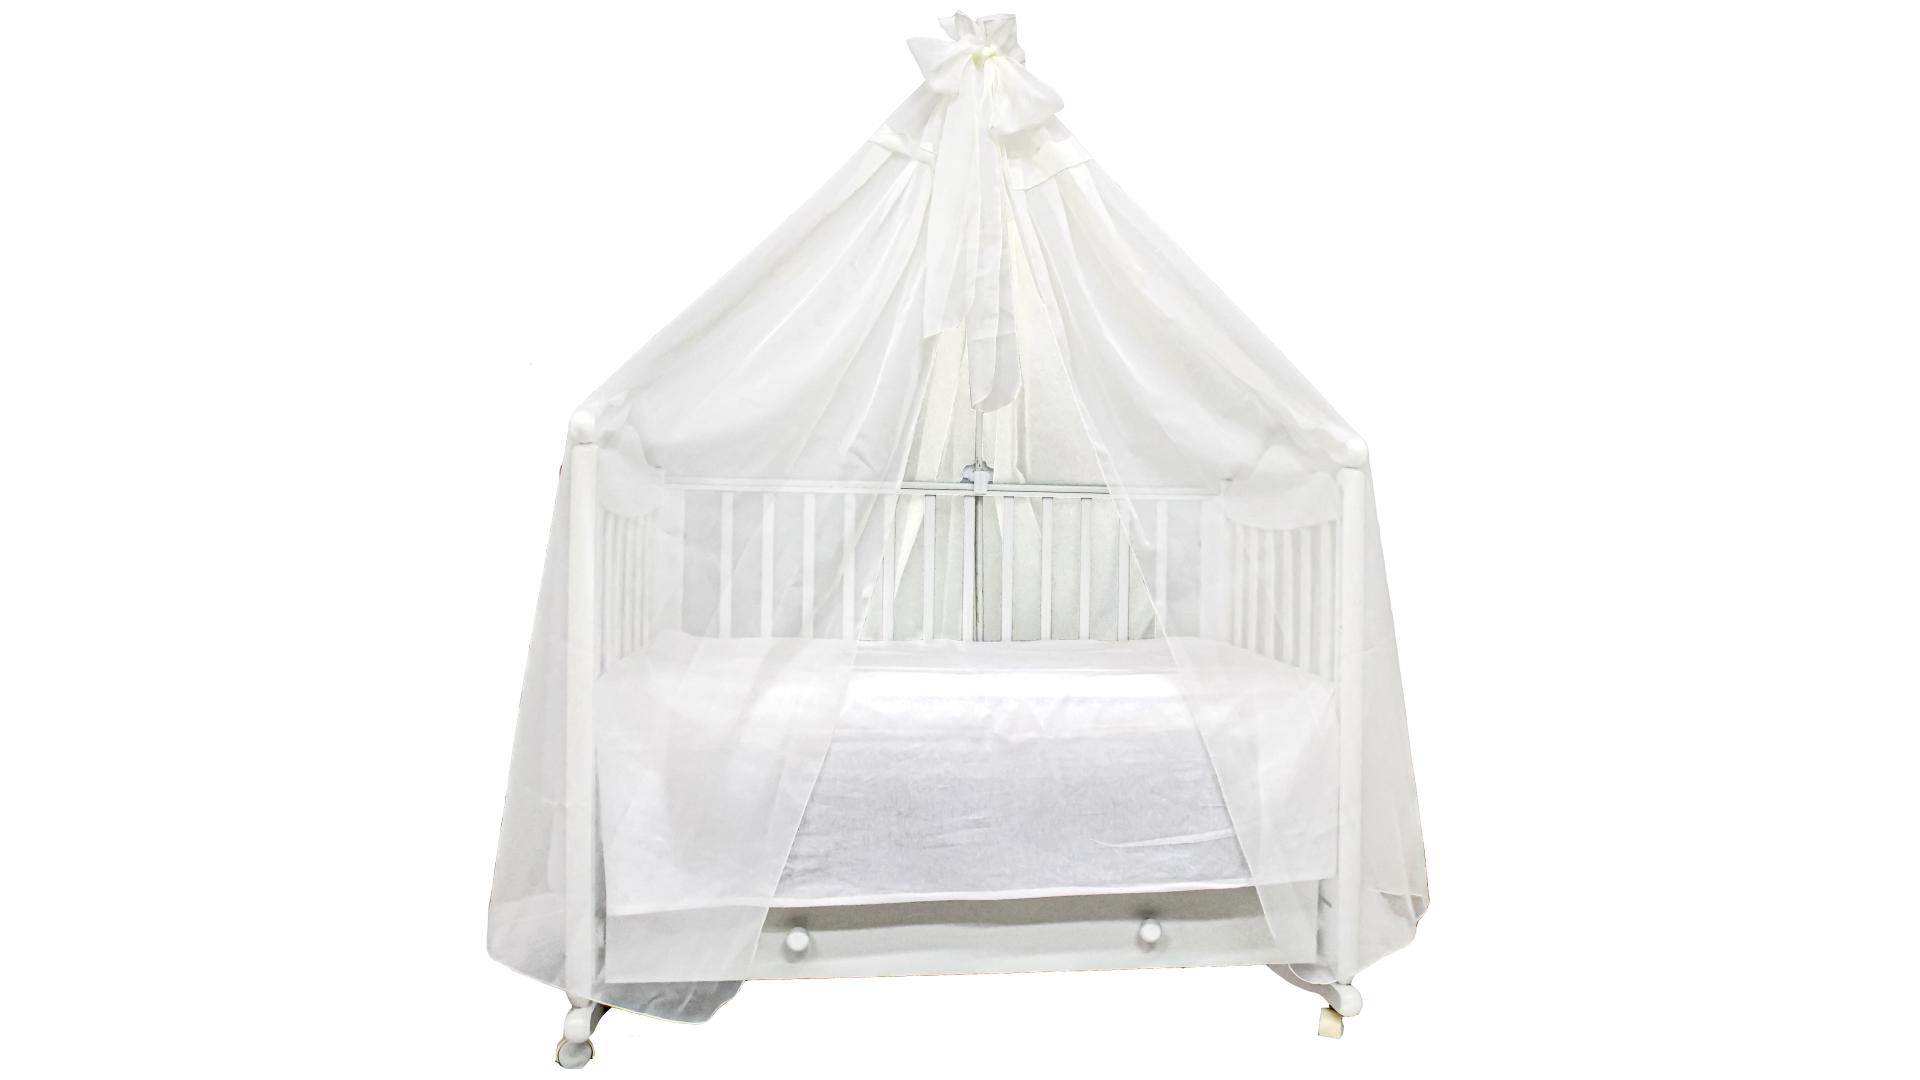 Аксессуар в кроватку Балдахин Экрю фото FullHD (0)